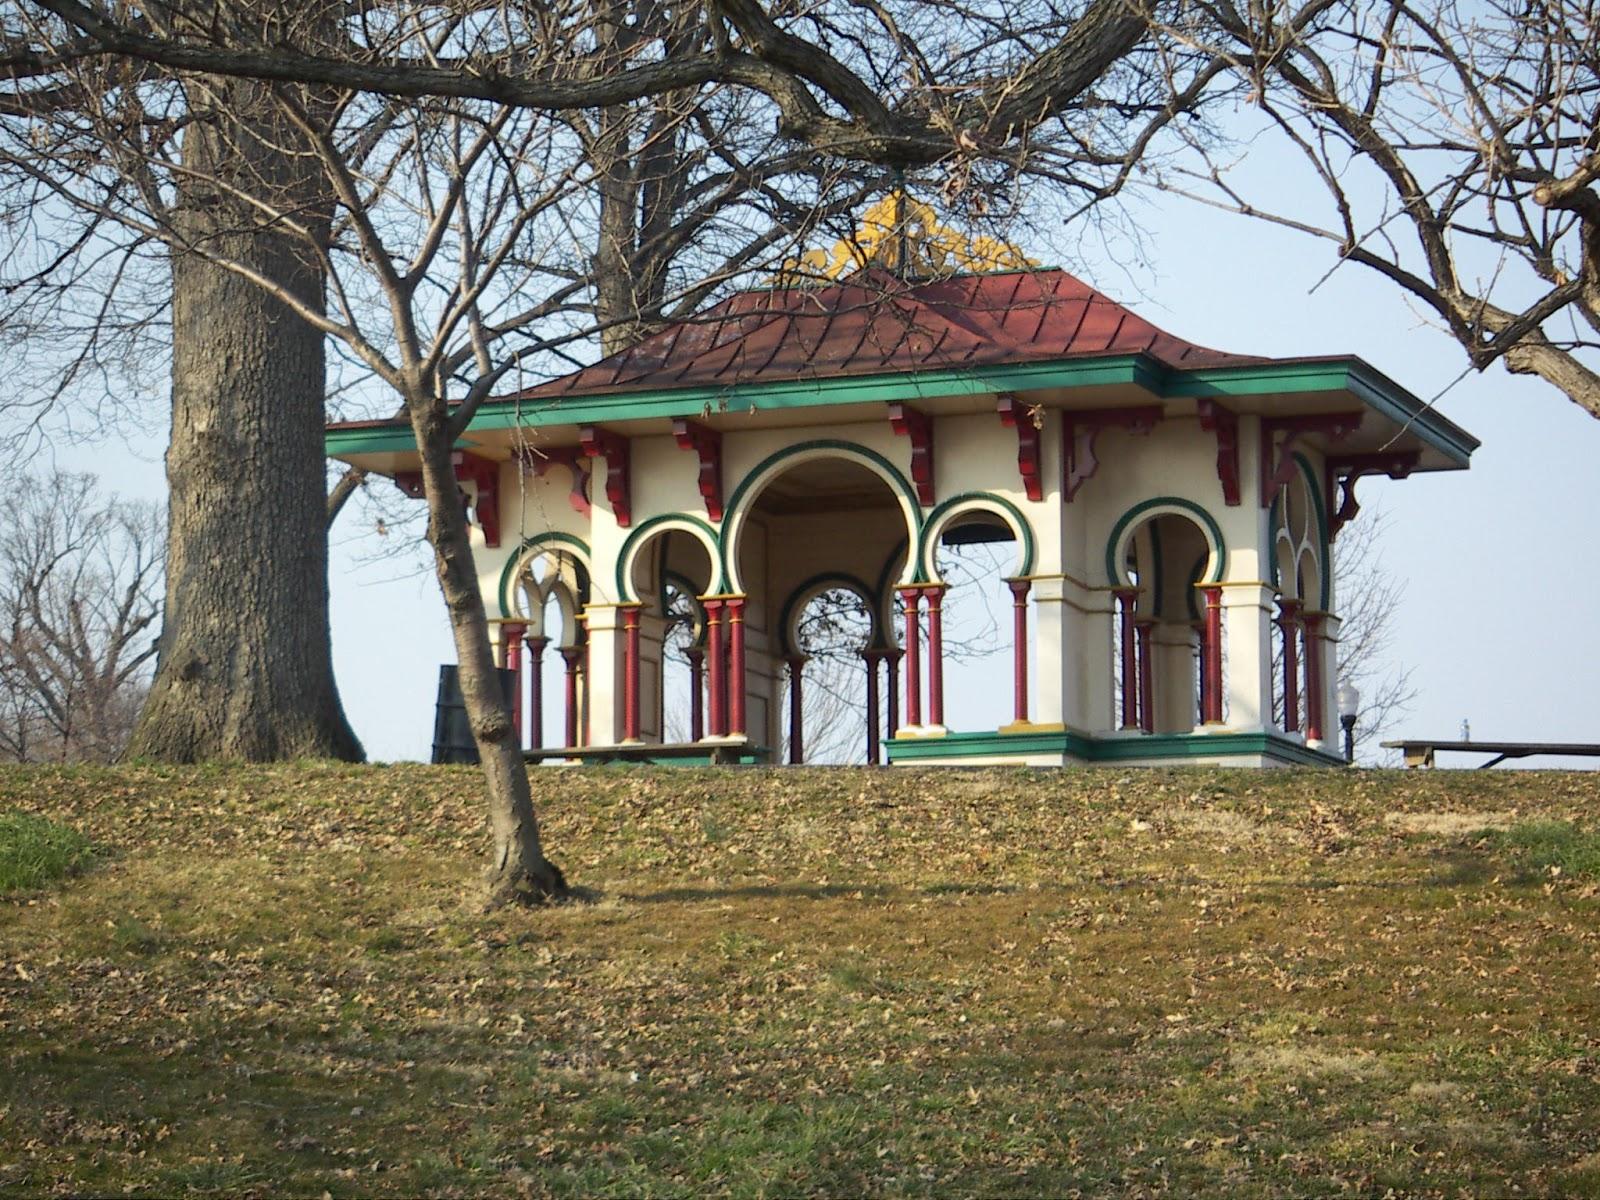 The druid hill park pavilion i love the colors